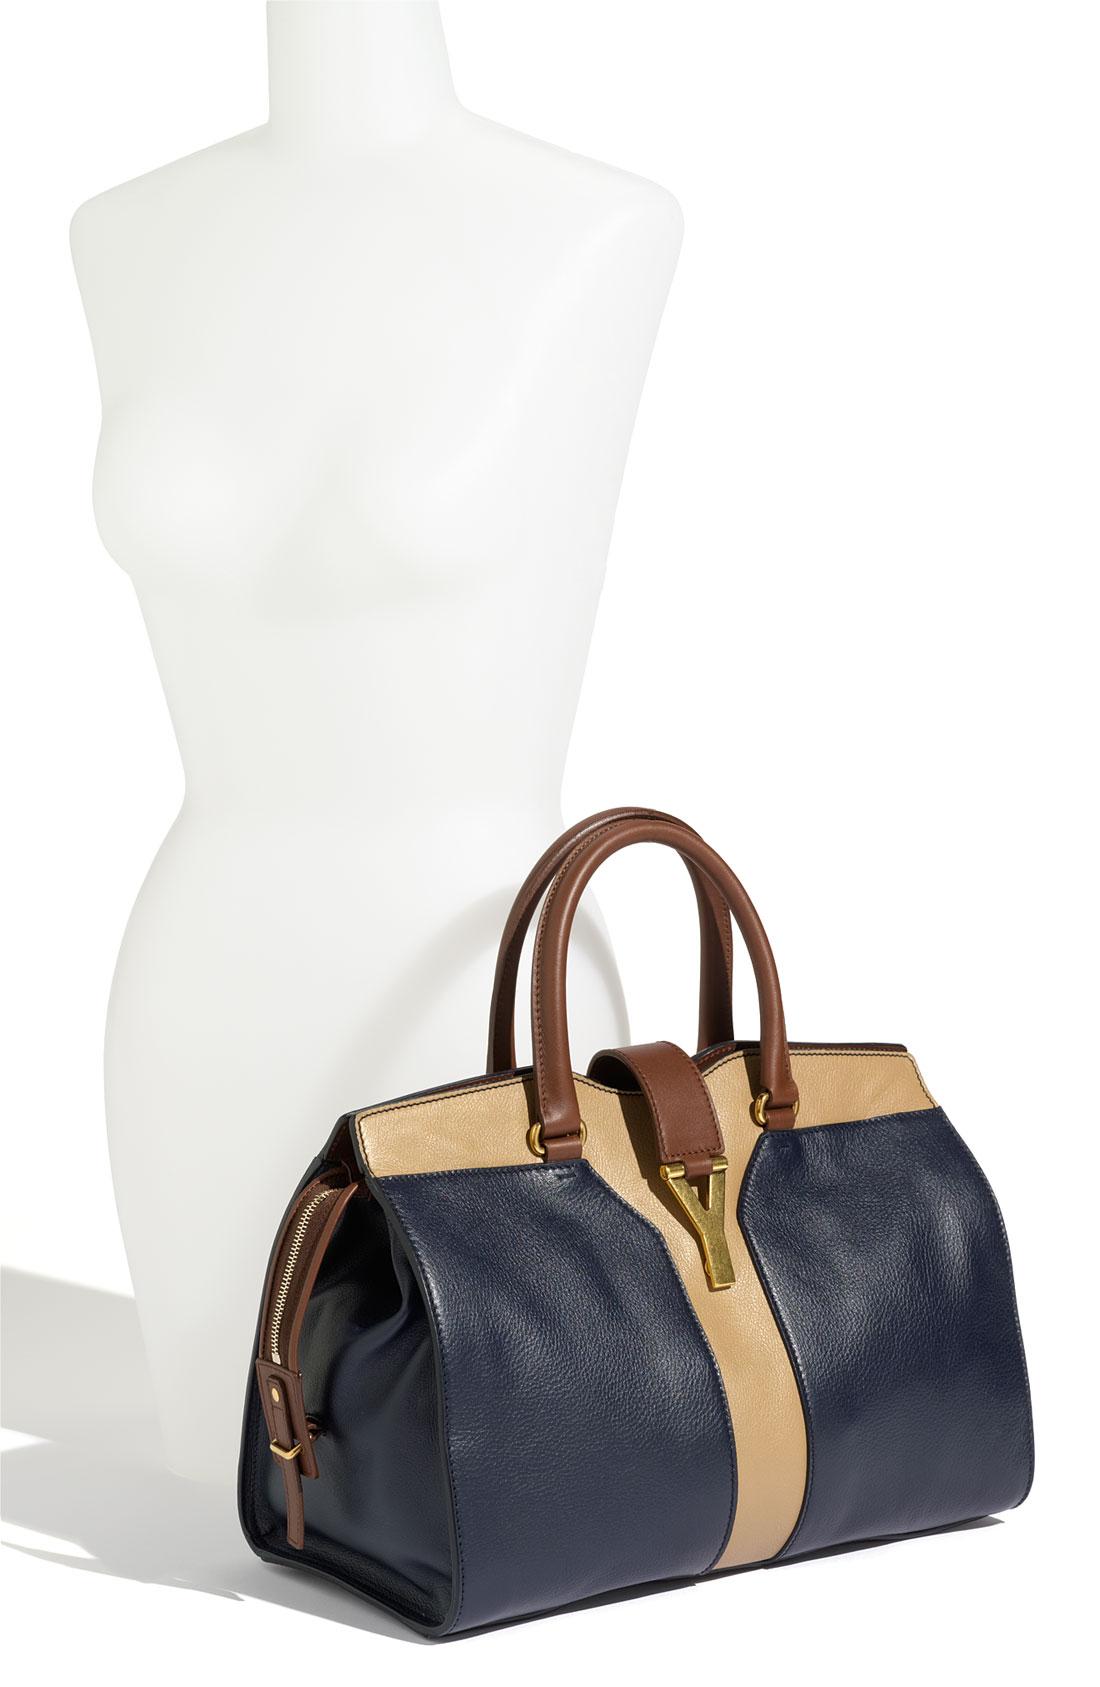 yves saint laurent satchel yves saint laurent sale bags. Black Bedroom Furniture Sets. Home Design Ideas